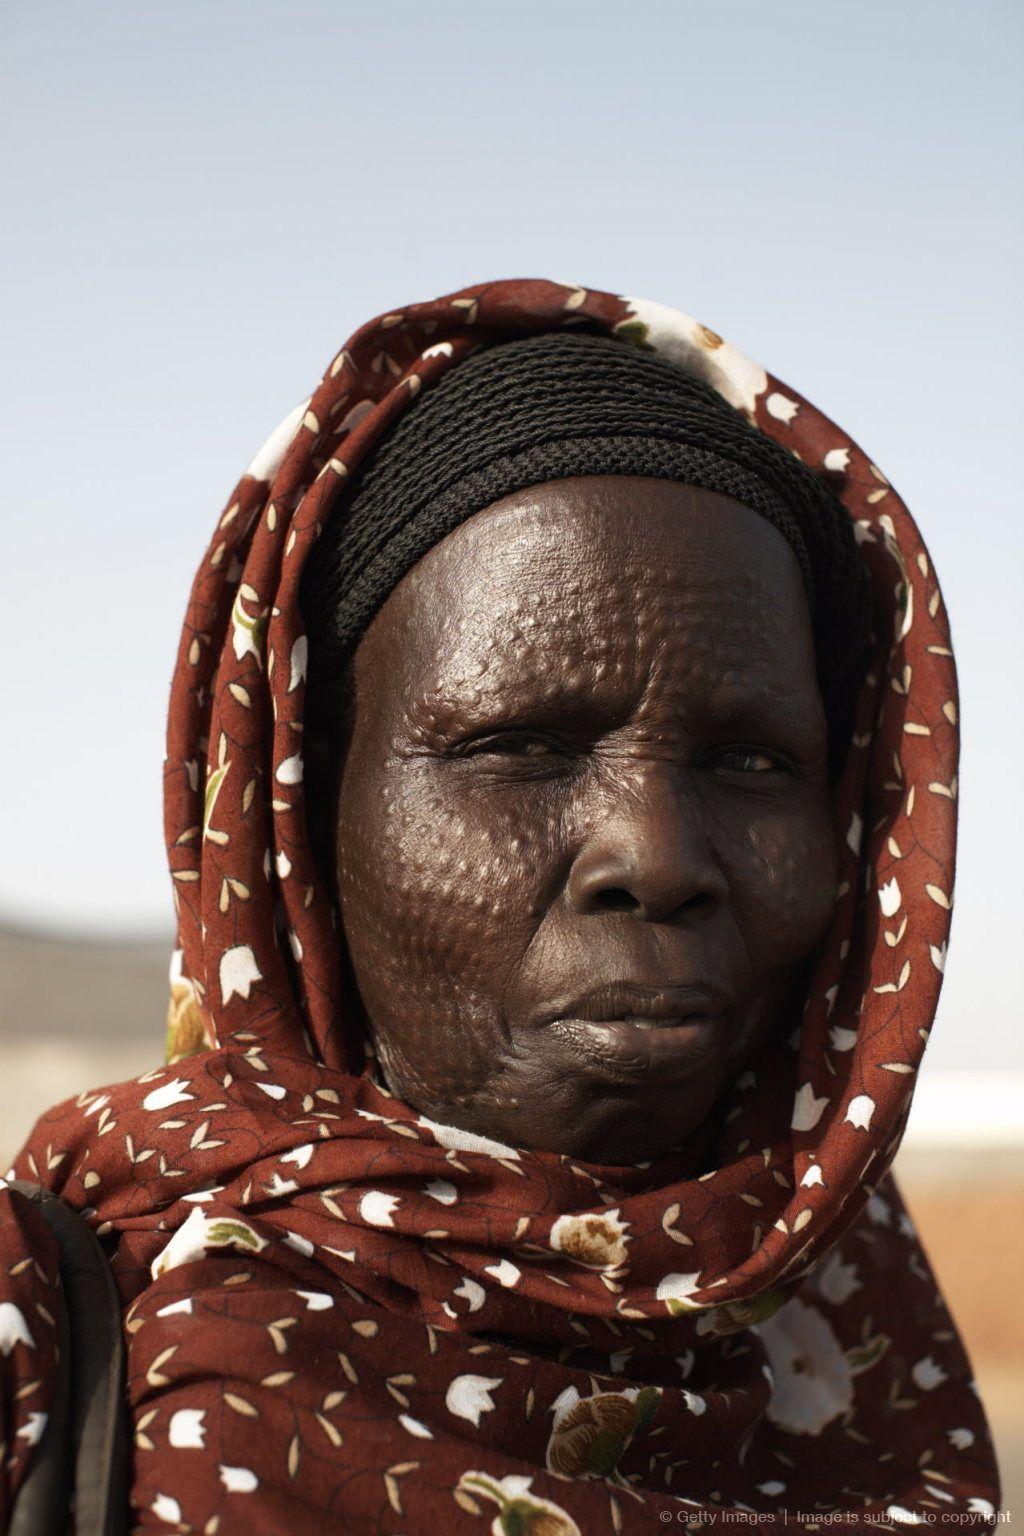 South Sudanese woman bearing tribal scarification markings